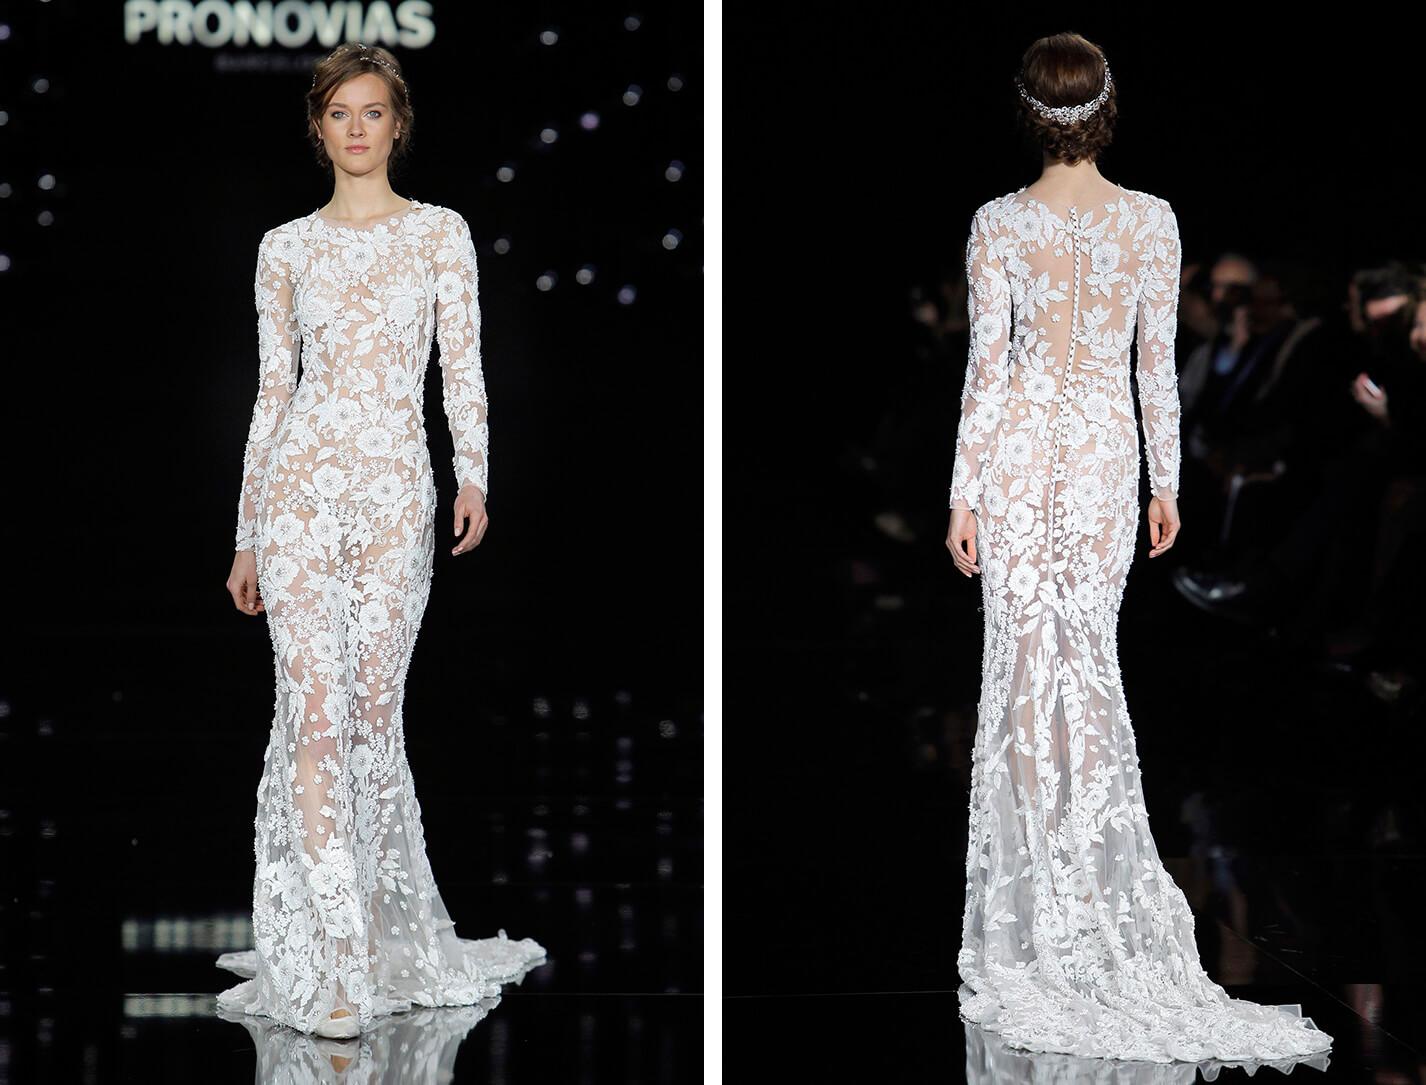 PRONOVIAS_Fashion_Show_2017_Narciso